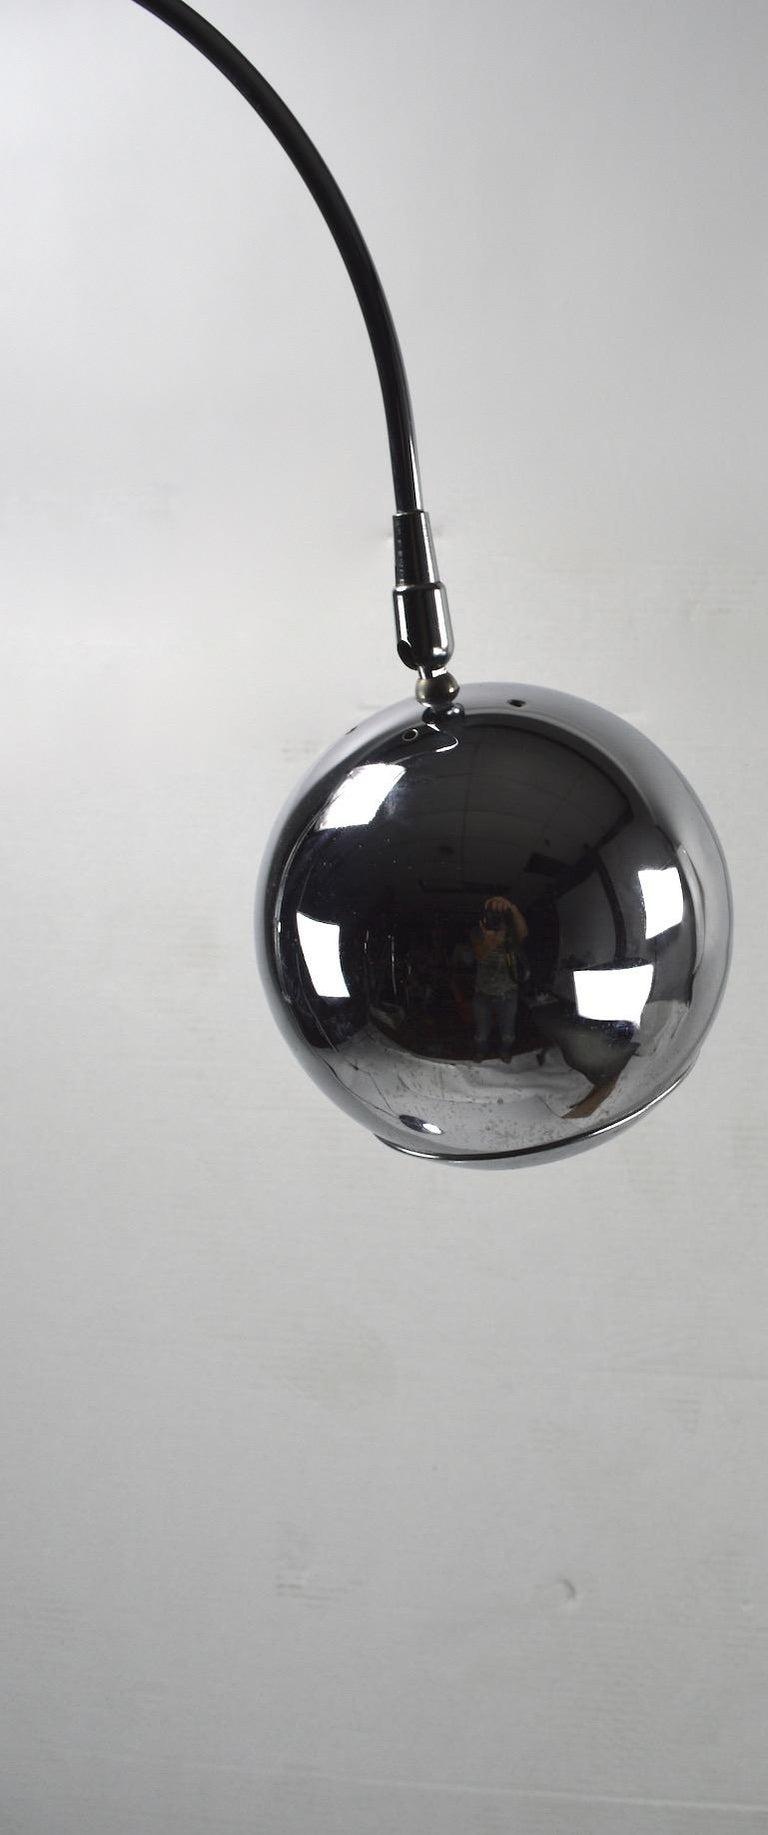 Adjustable Chrome Arc Lamp with Eyeball Shade For Sale 4